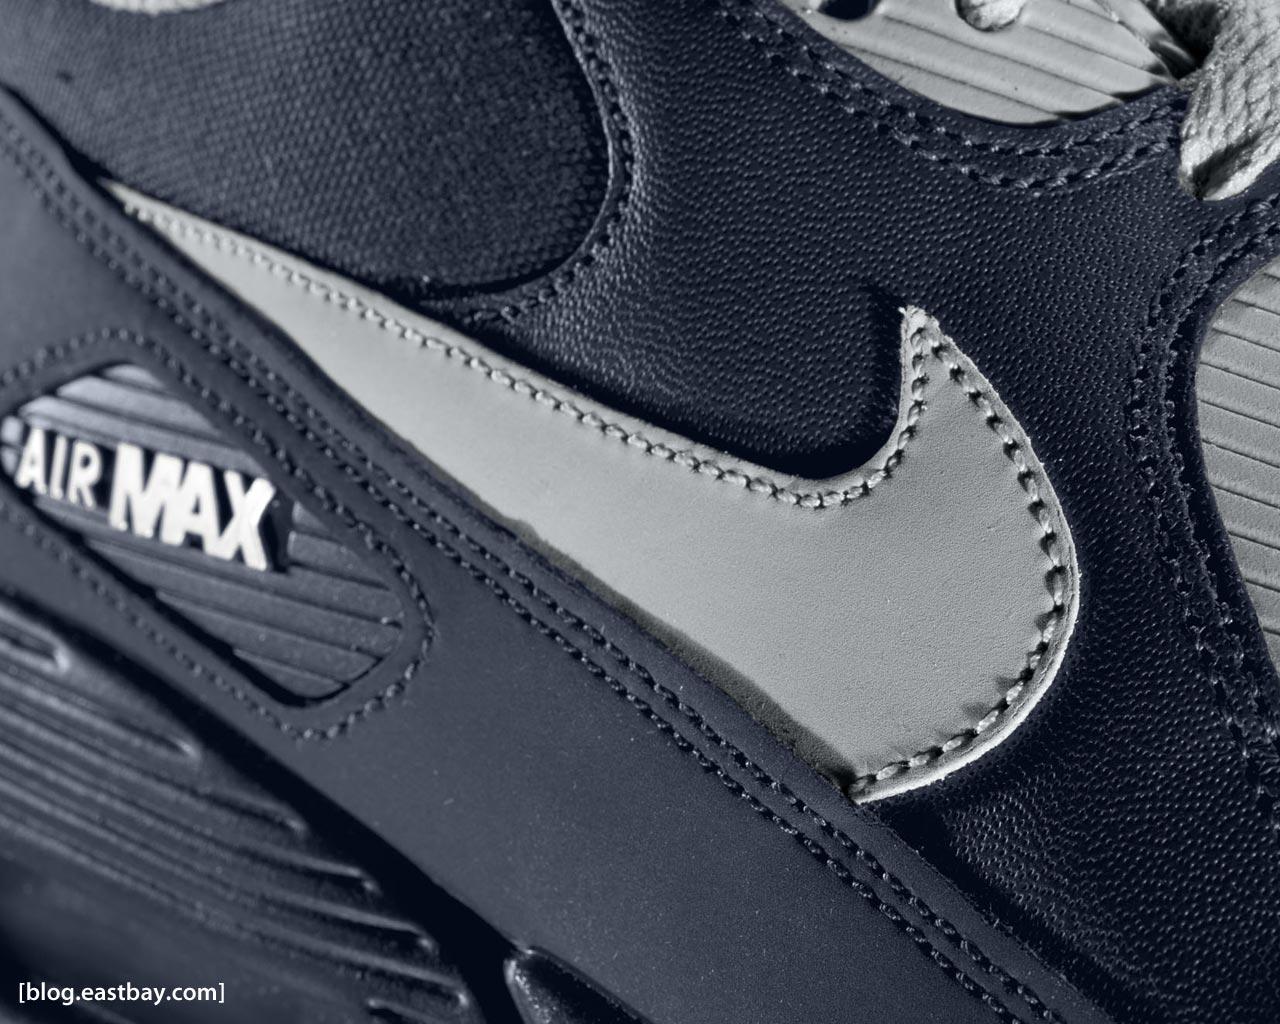 ... Nike Air Max Wallpapers - Wallpaper Cave ... d2cb6bb1c9